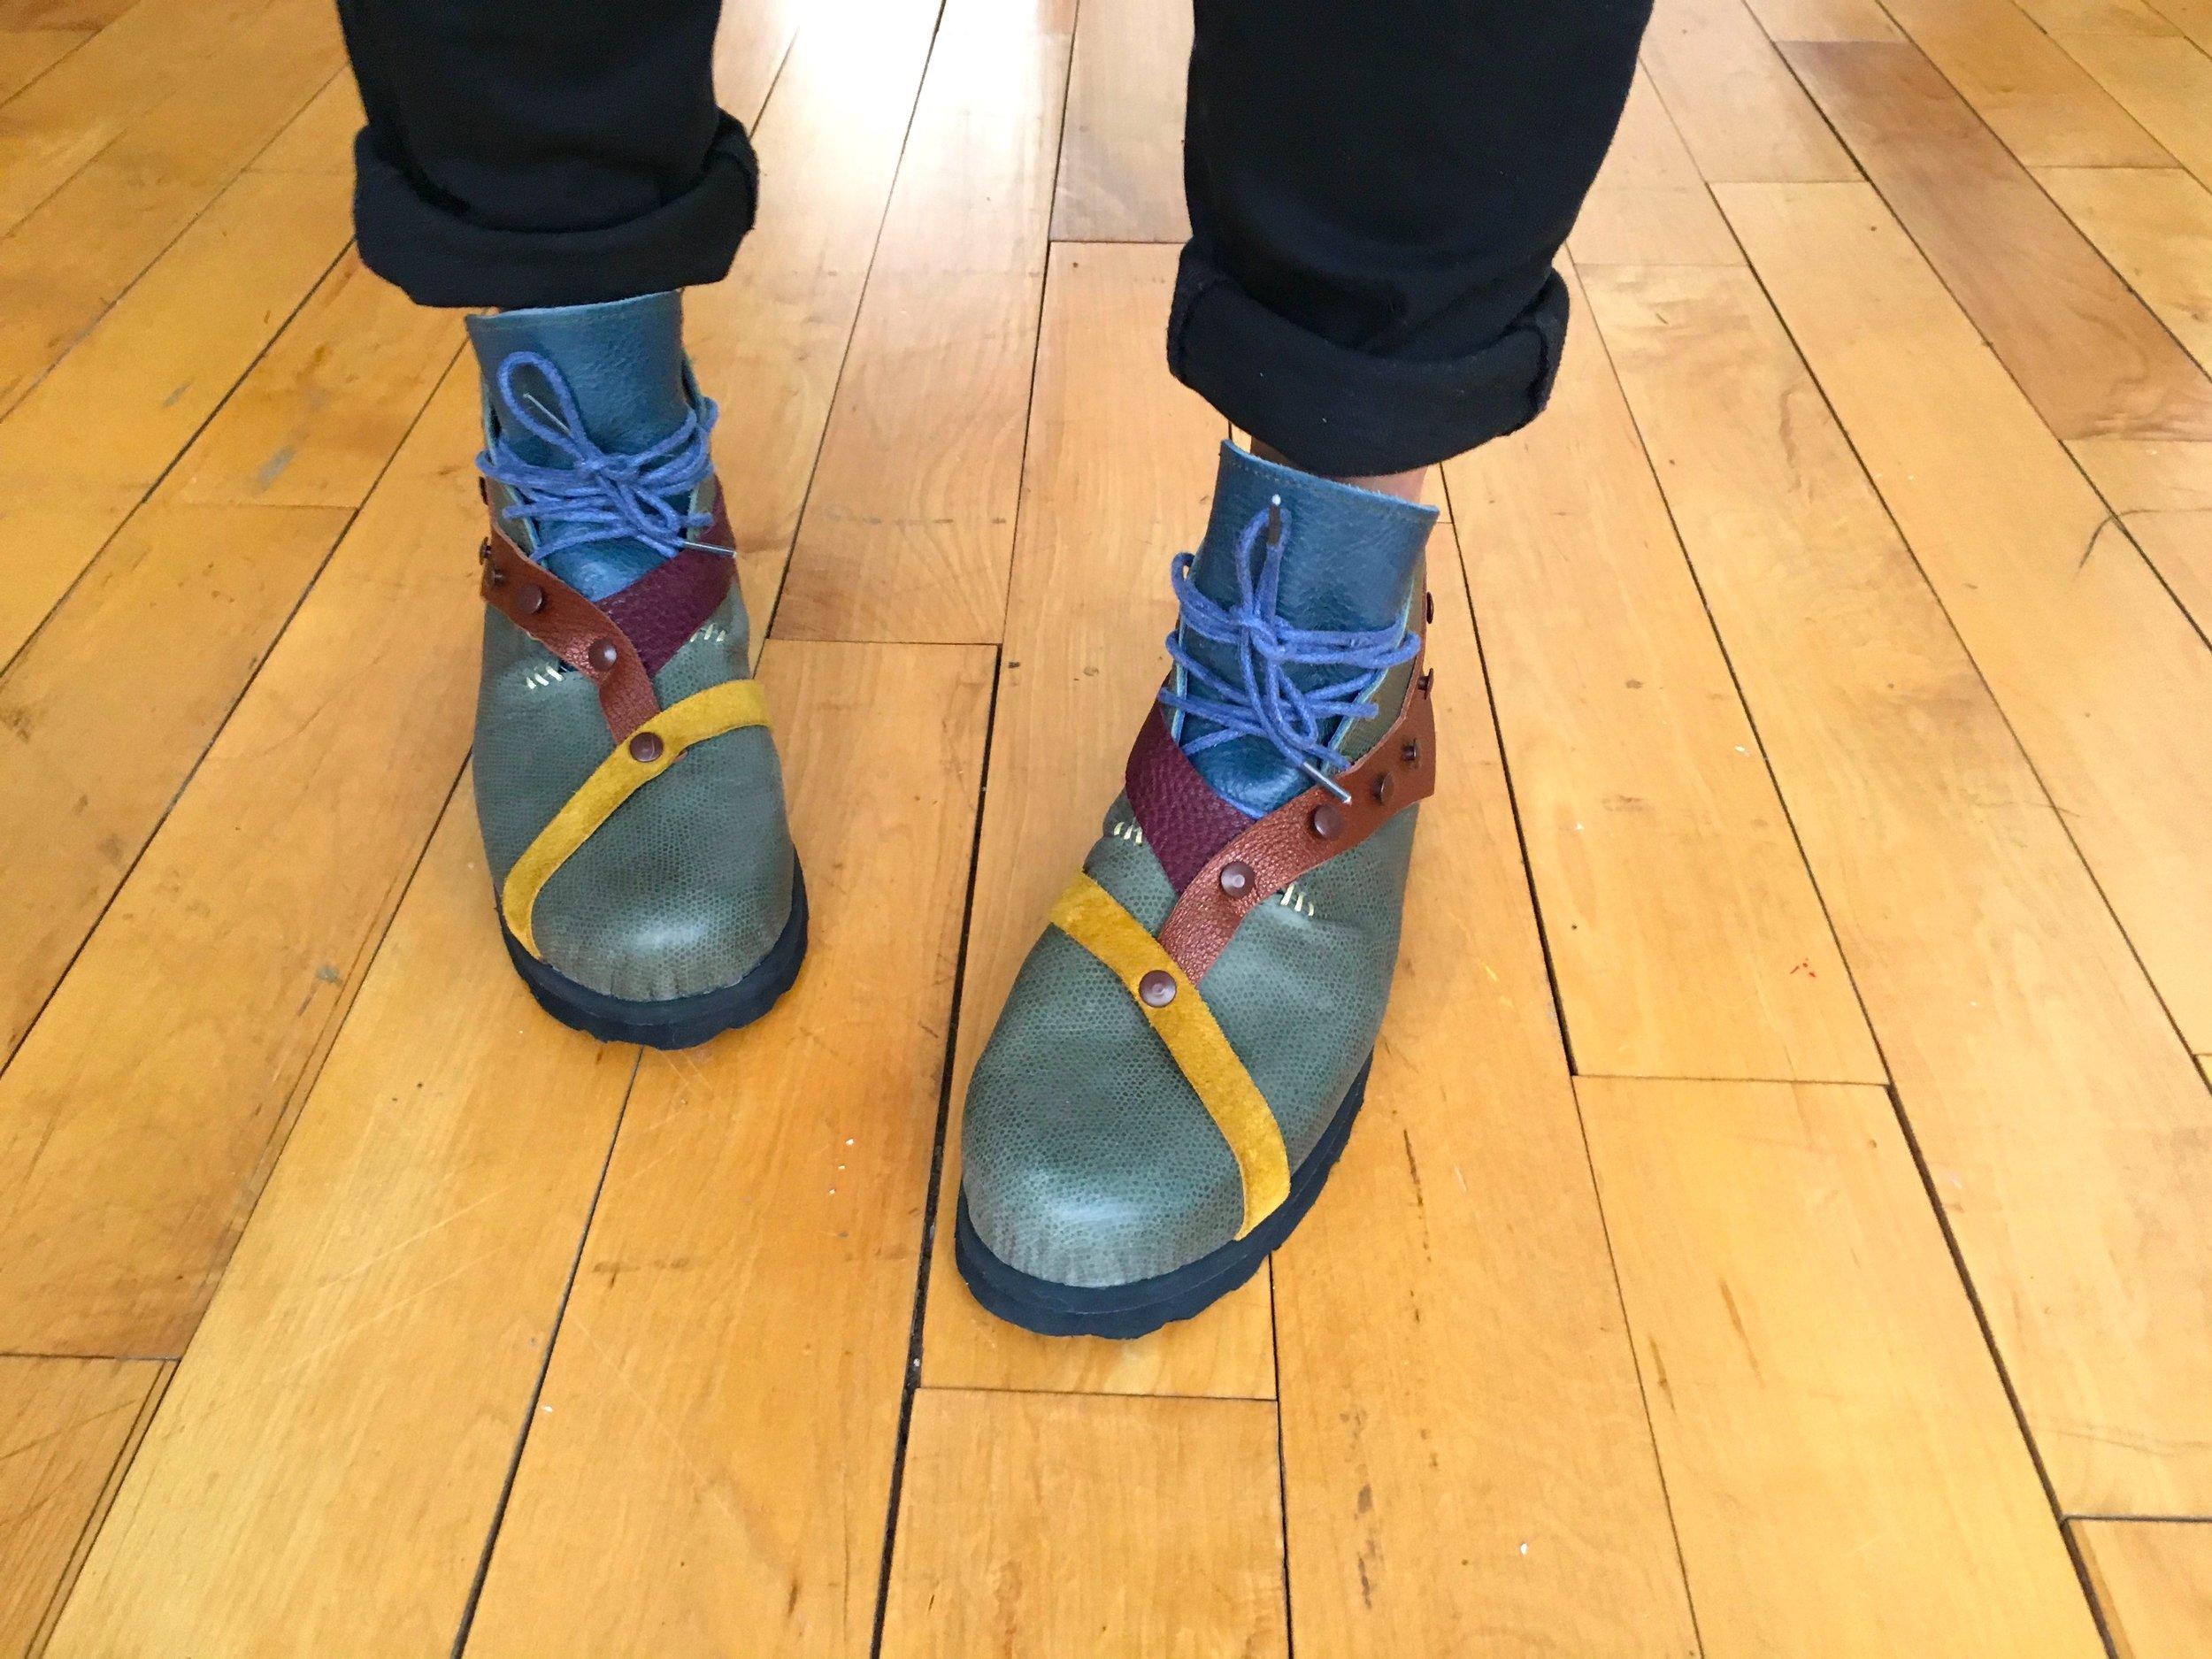 4th ave boot front walking horizontal.jpg